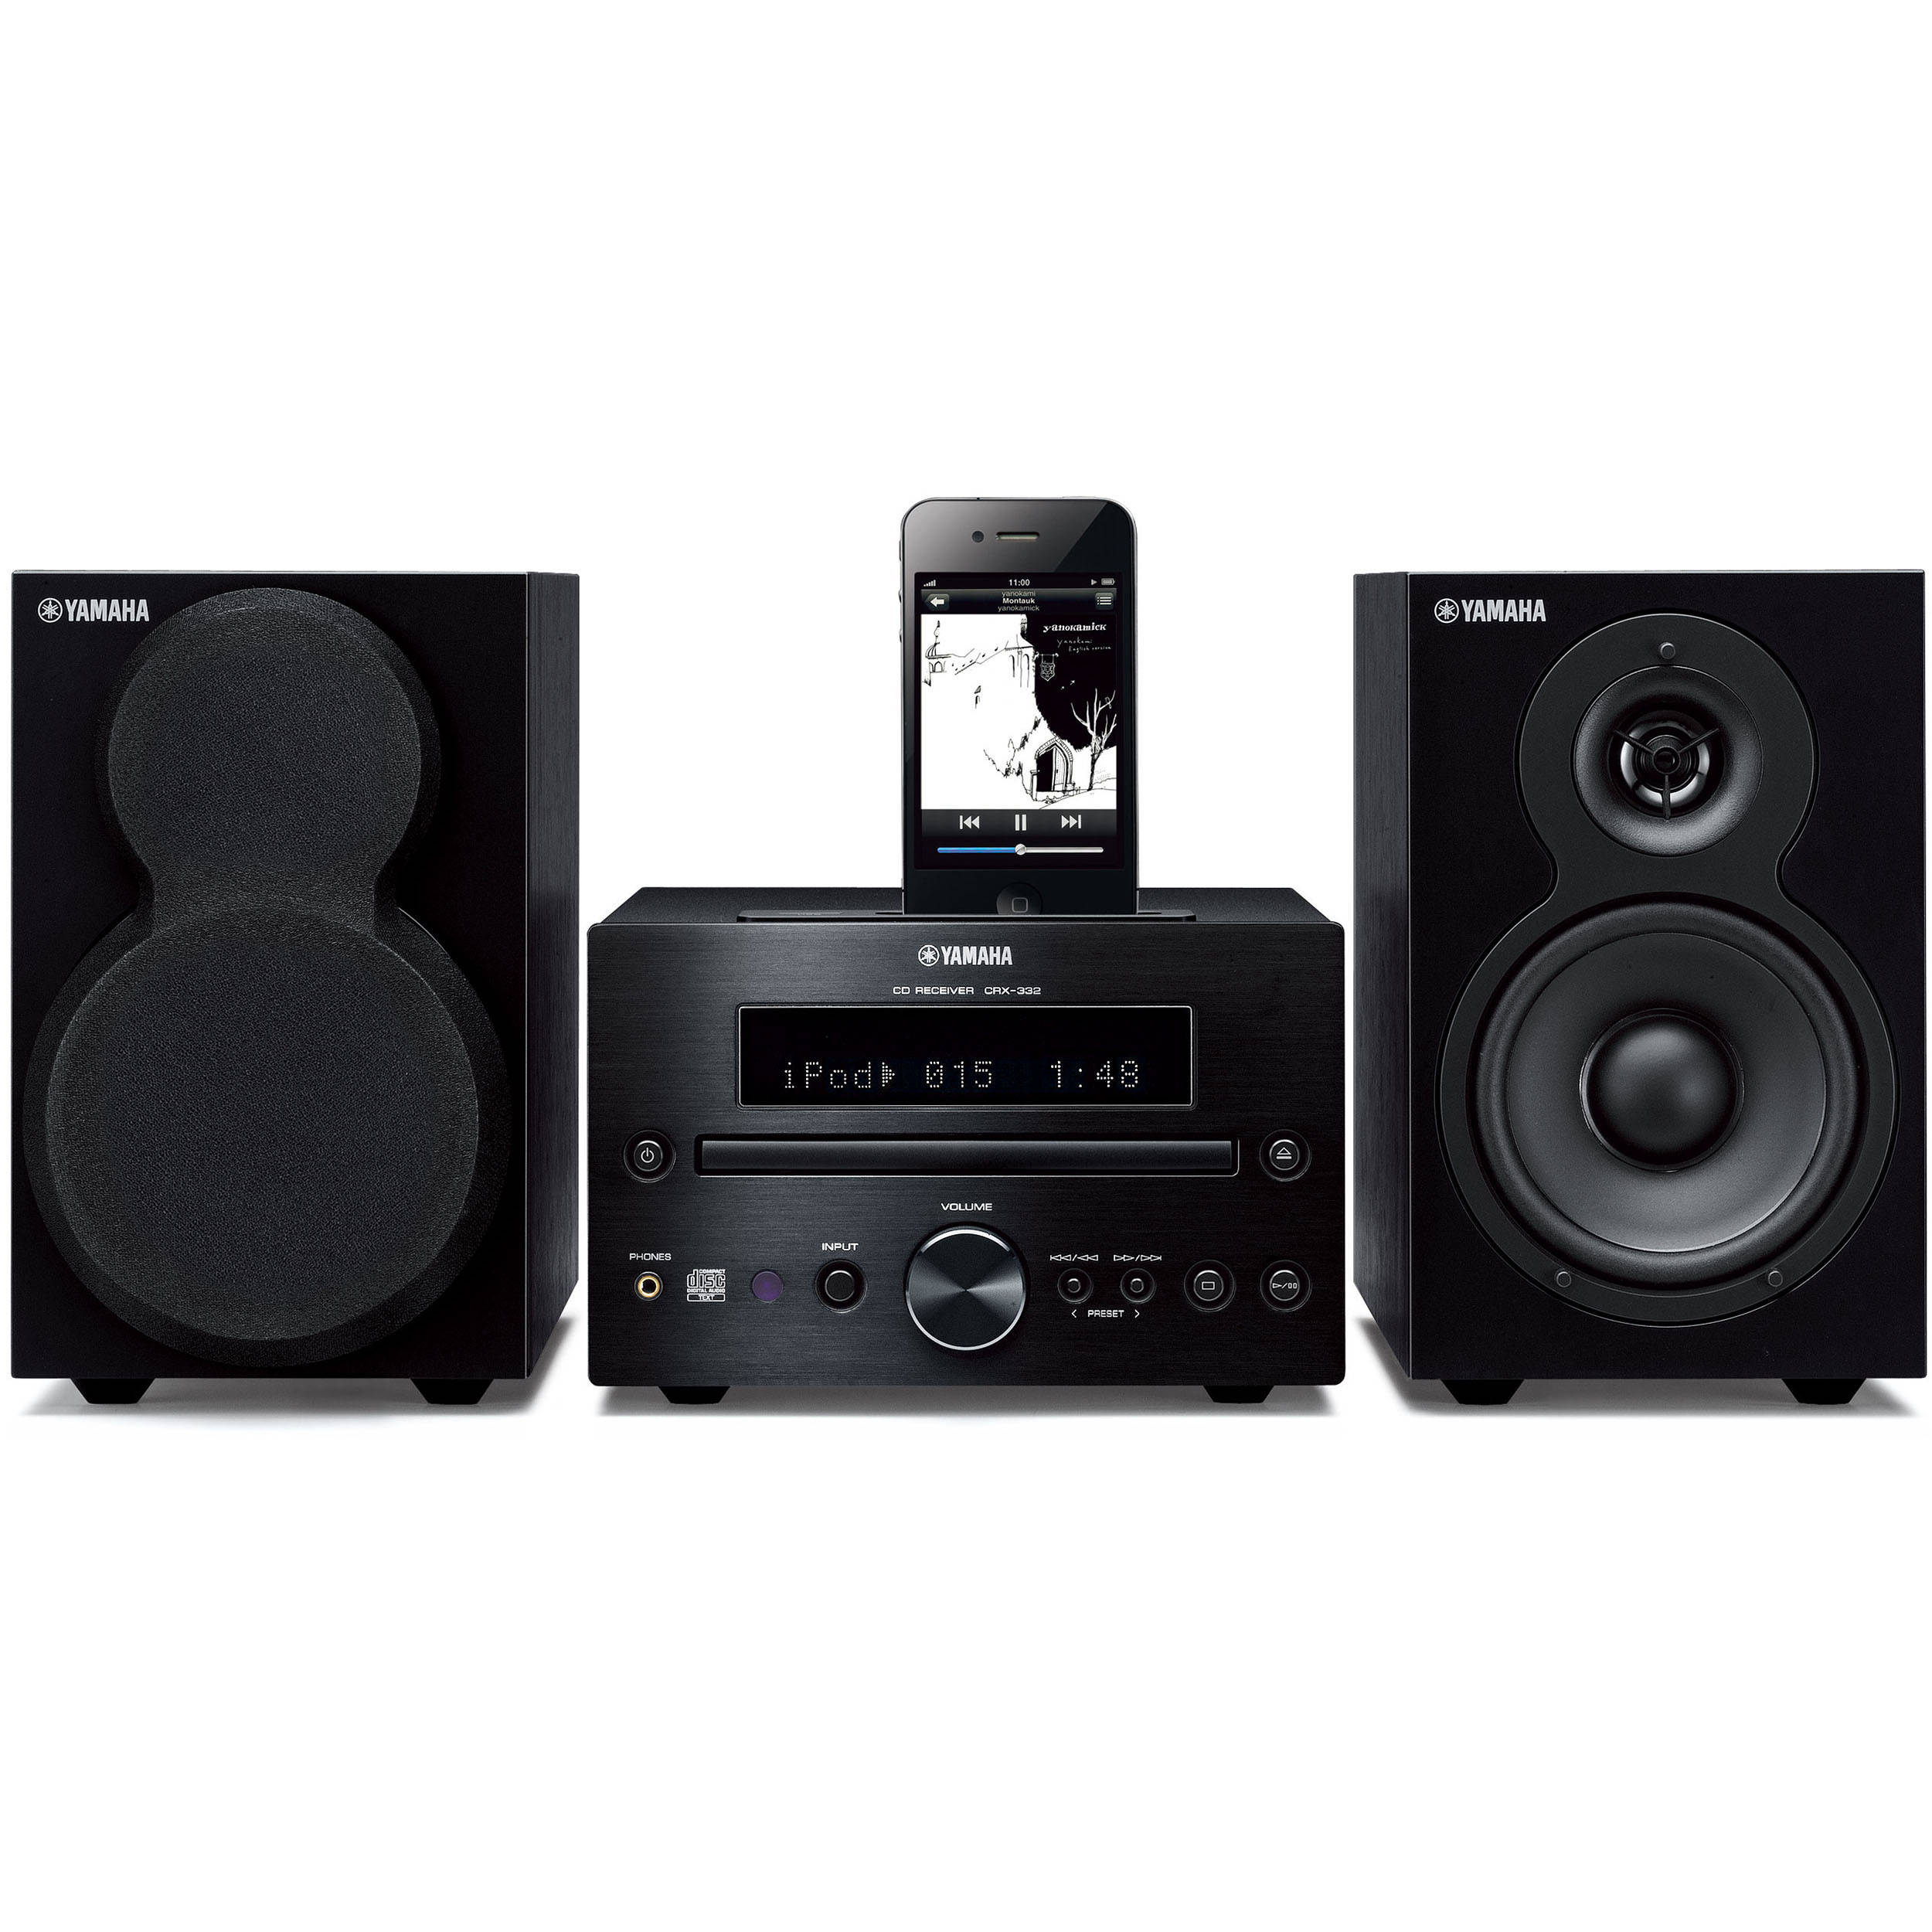 Yamaha Mini System Dvd